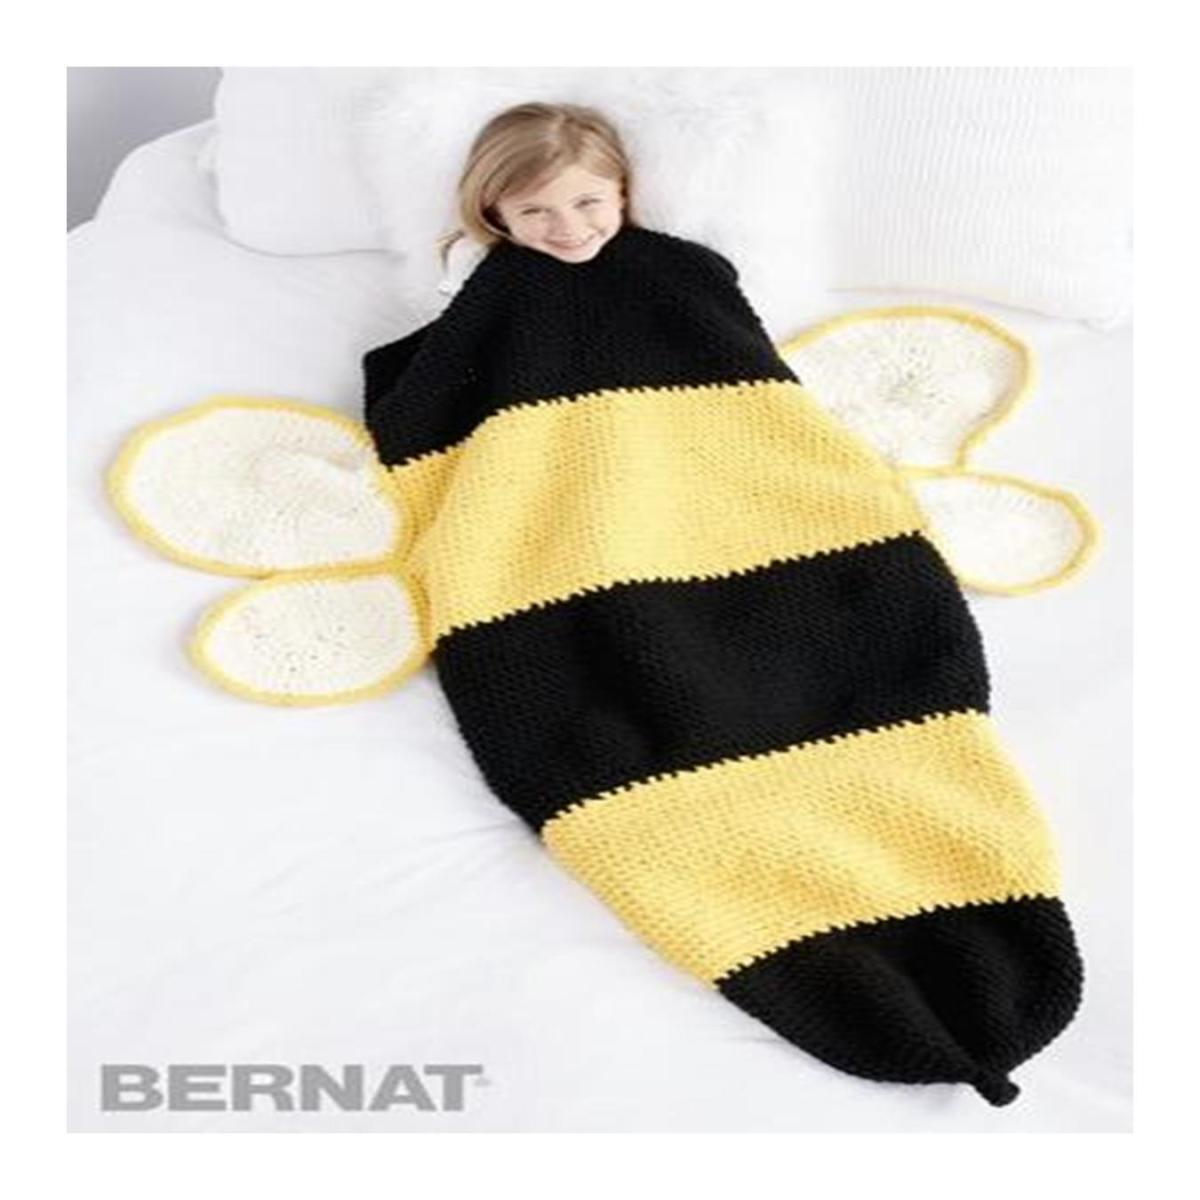 Bumble Bee Crochet Snuggle Sack